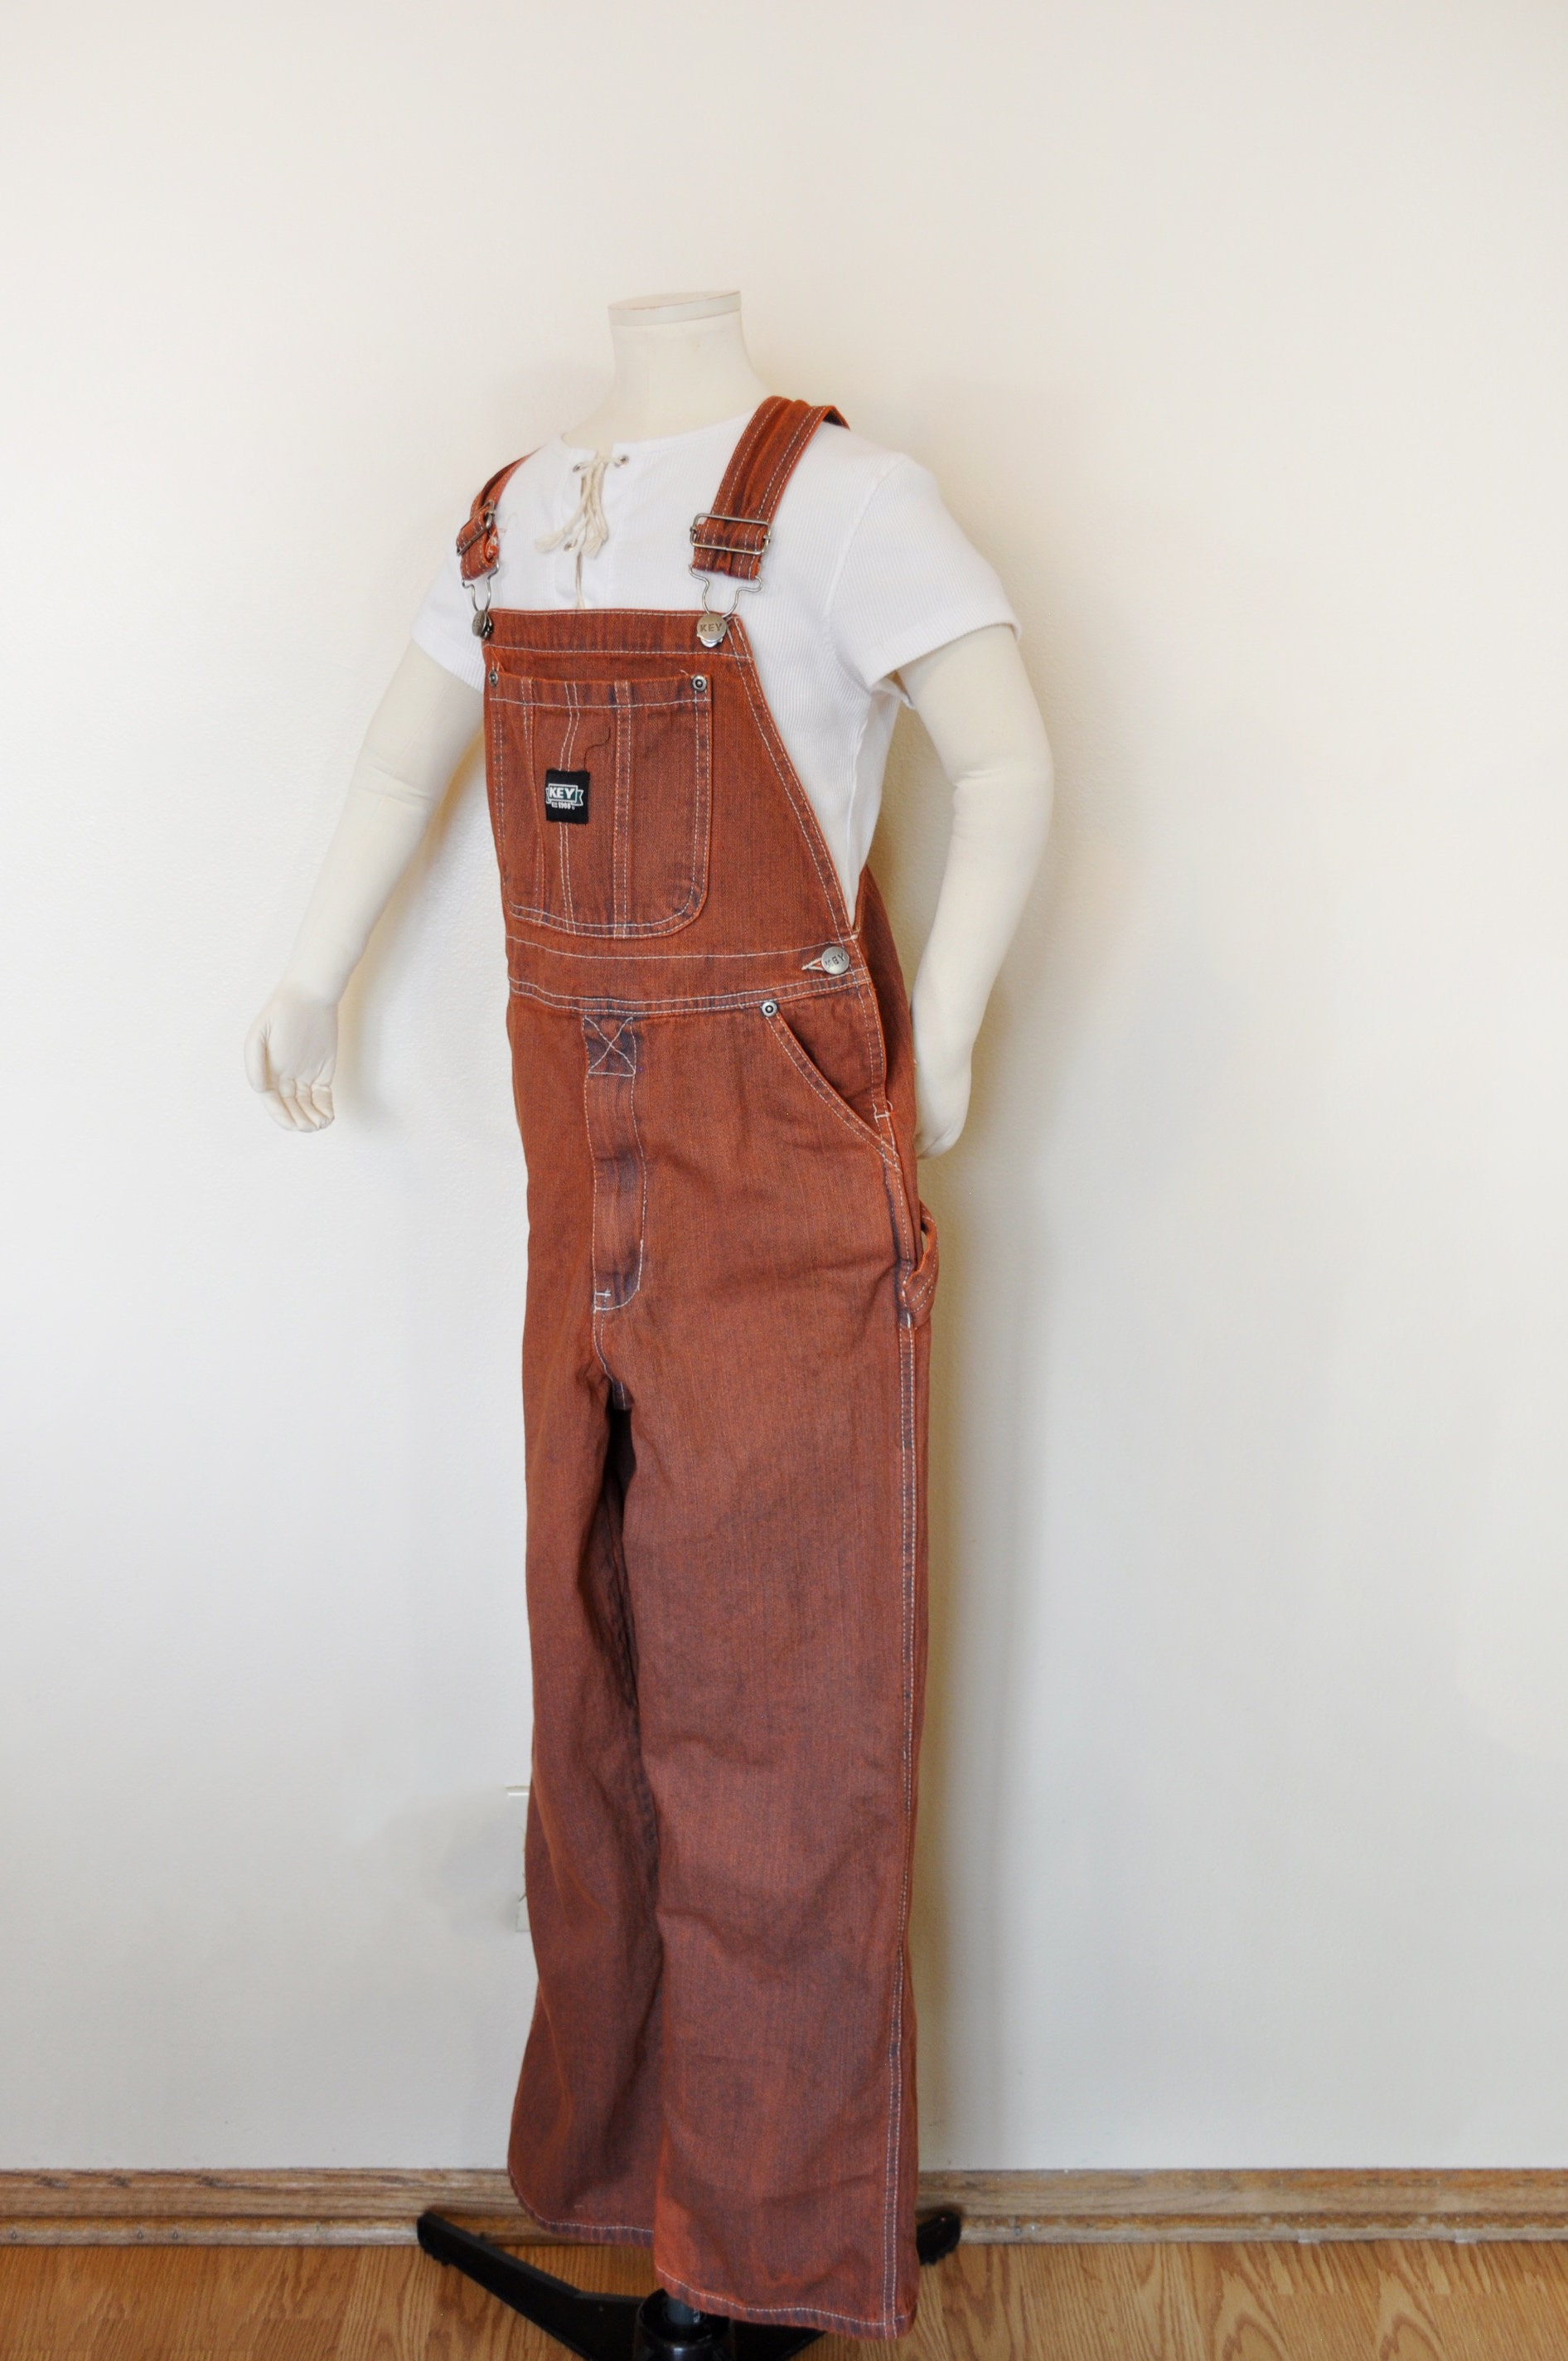 Vintage Overalls & Jumpsuits Orange 14 Large Bib Overall Pants - Dyed Upcycled Key Imperial Denim Overalls Teen Boys Girls Size  28W X 28L $25.00 AT vintagedancer.com